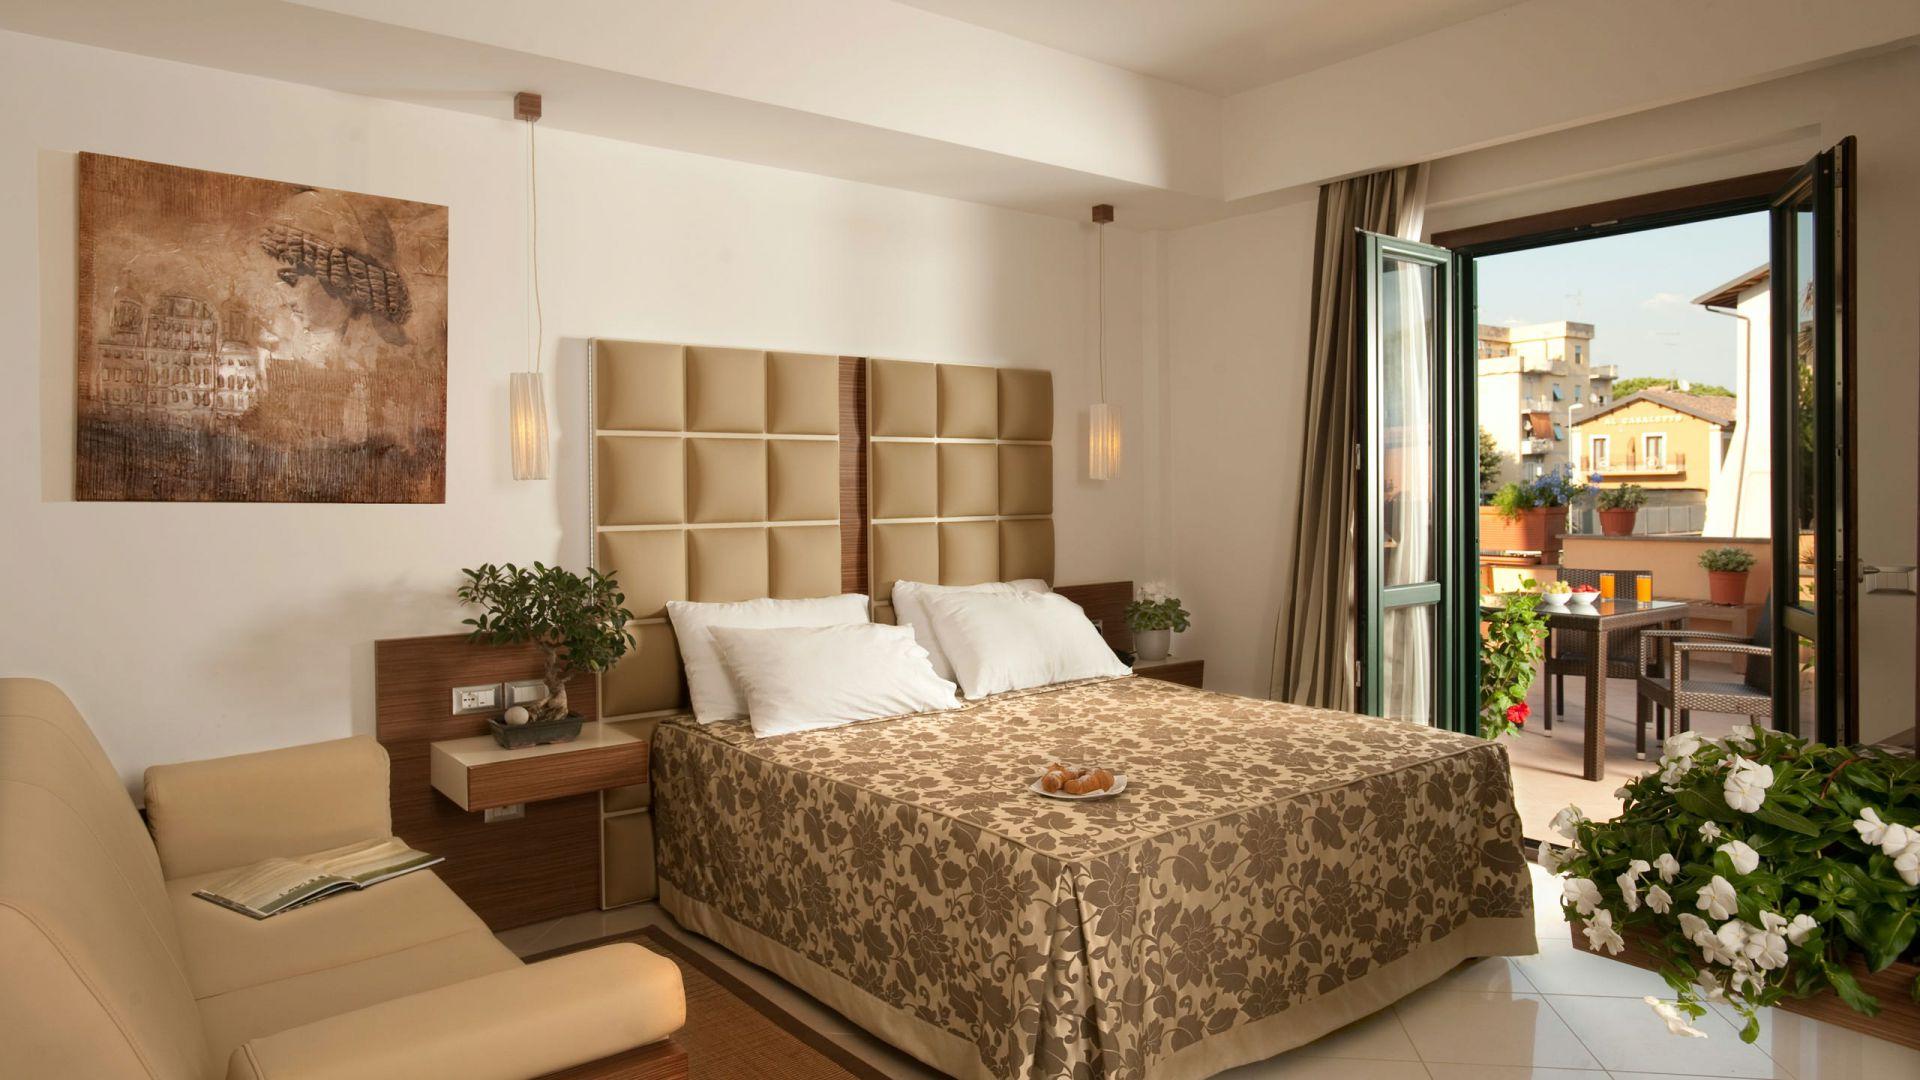 oc-hotel-villa-adriana-camere-015